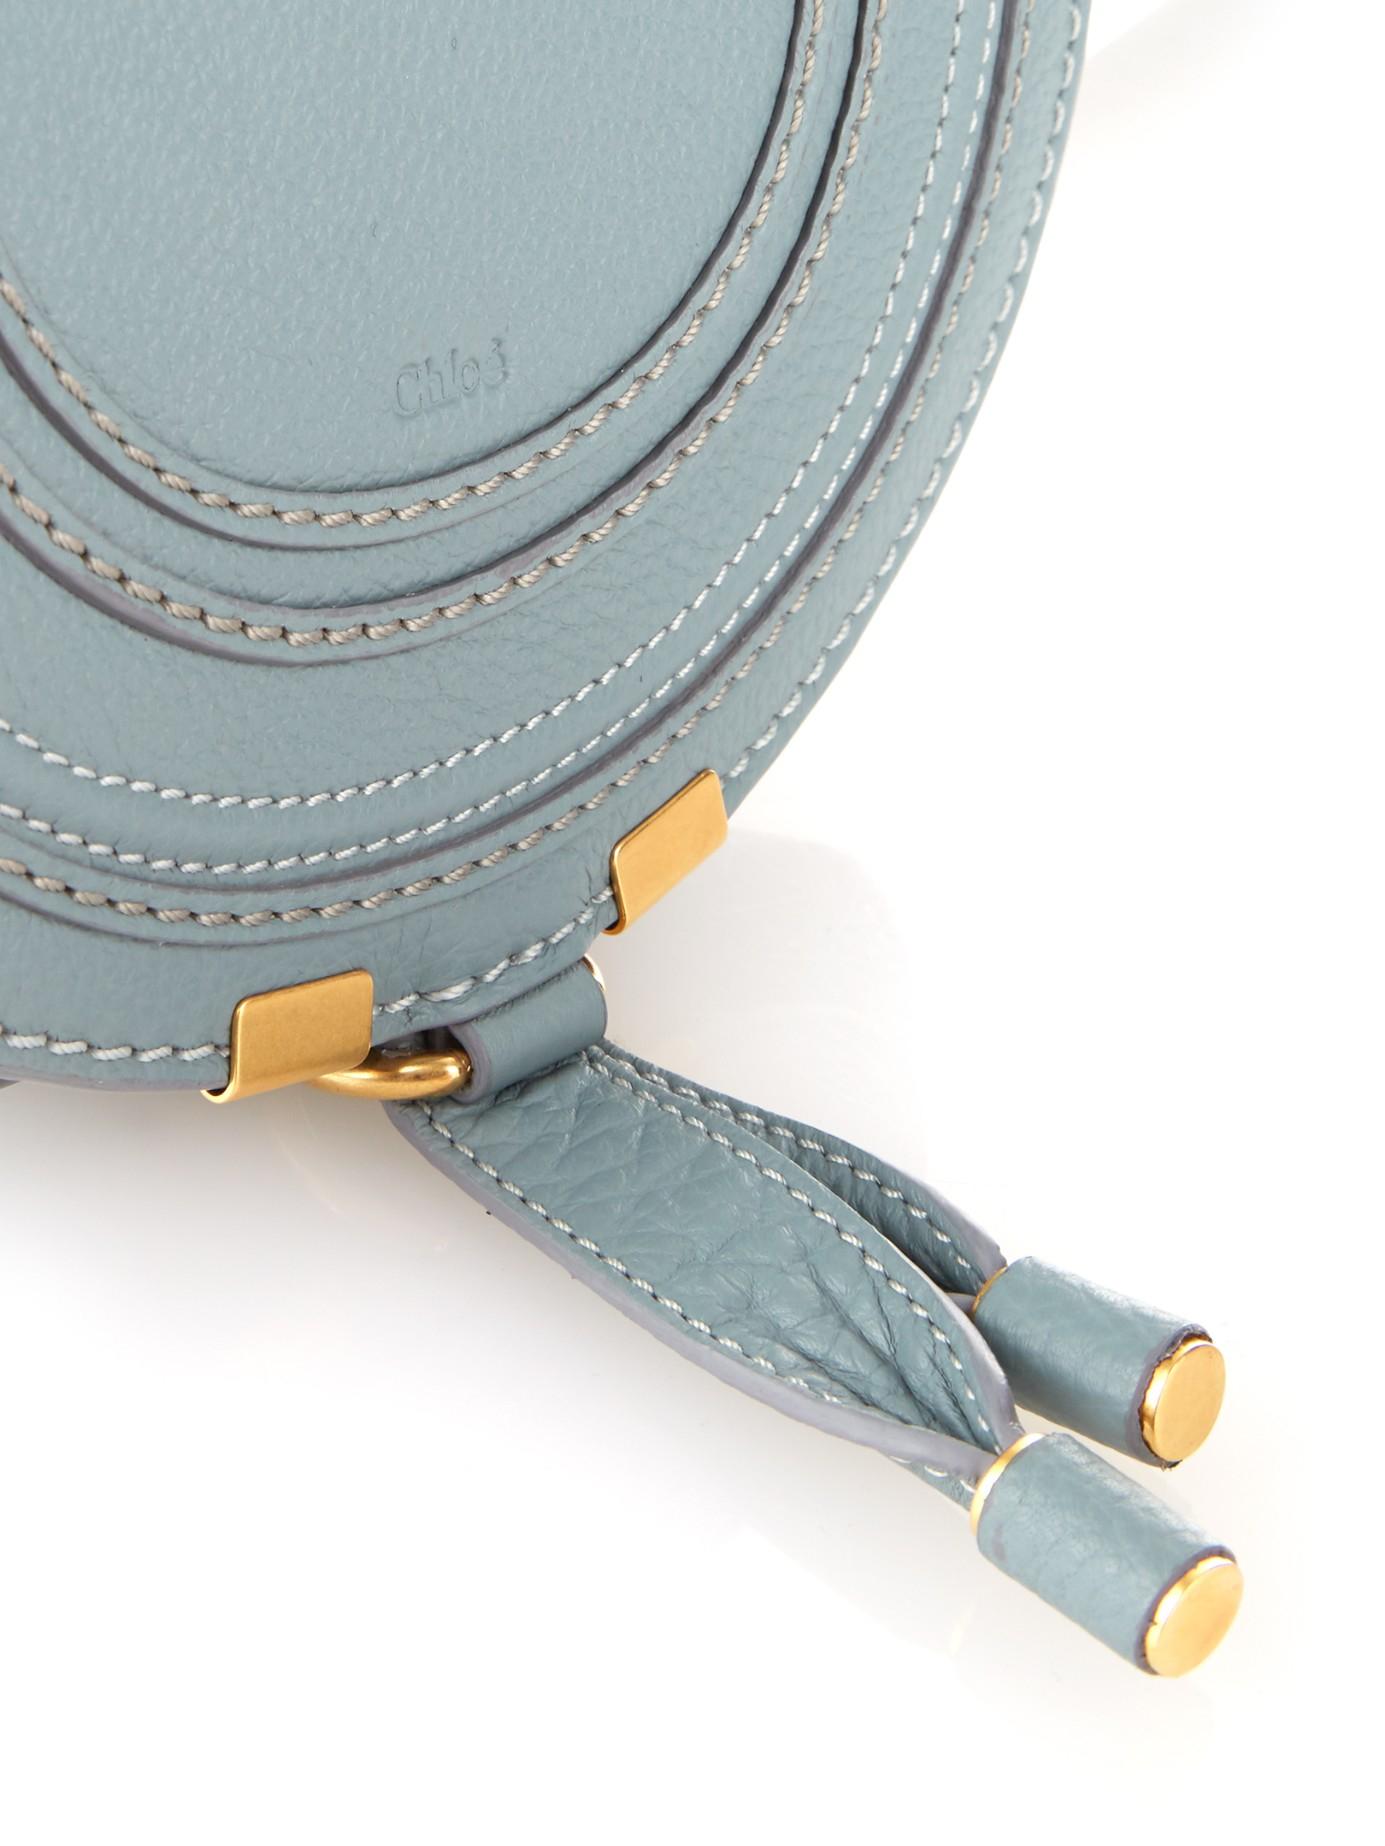 Chlo¨¦ Marcie Mini Leather Cross-body Bag in Blue (LIGHT BLUE) | Lyst